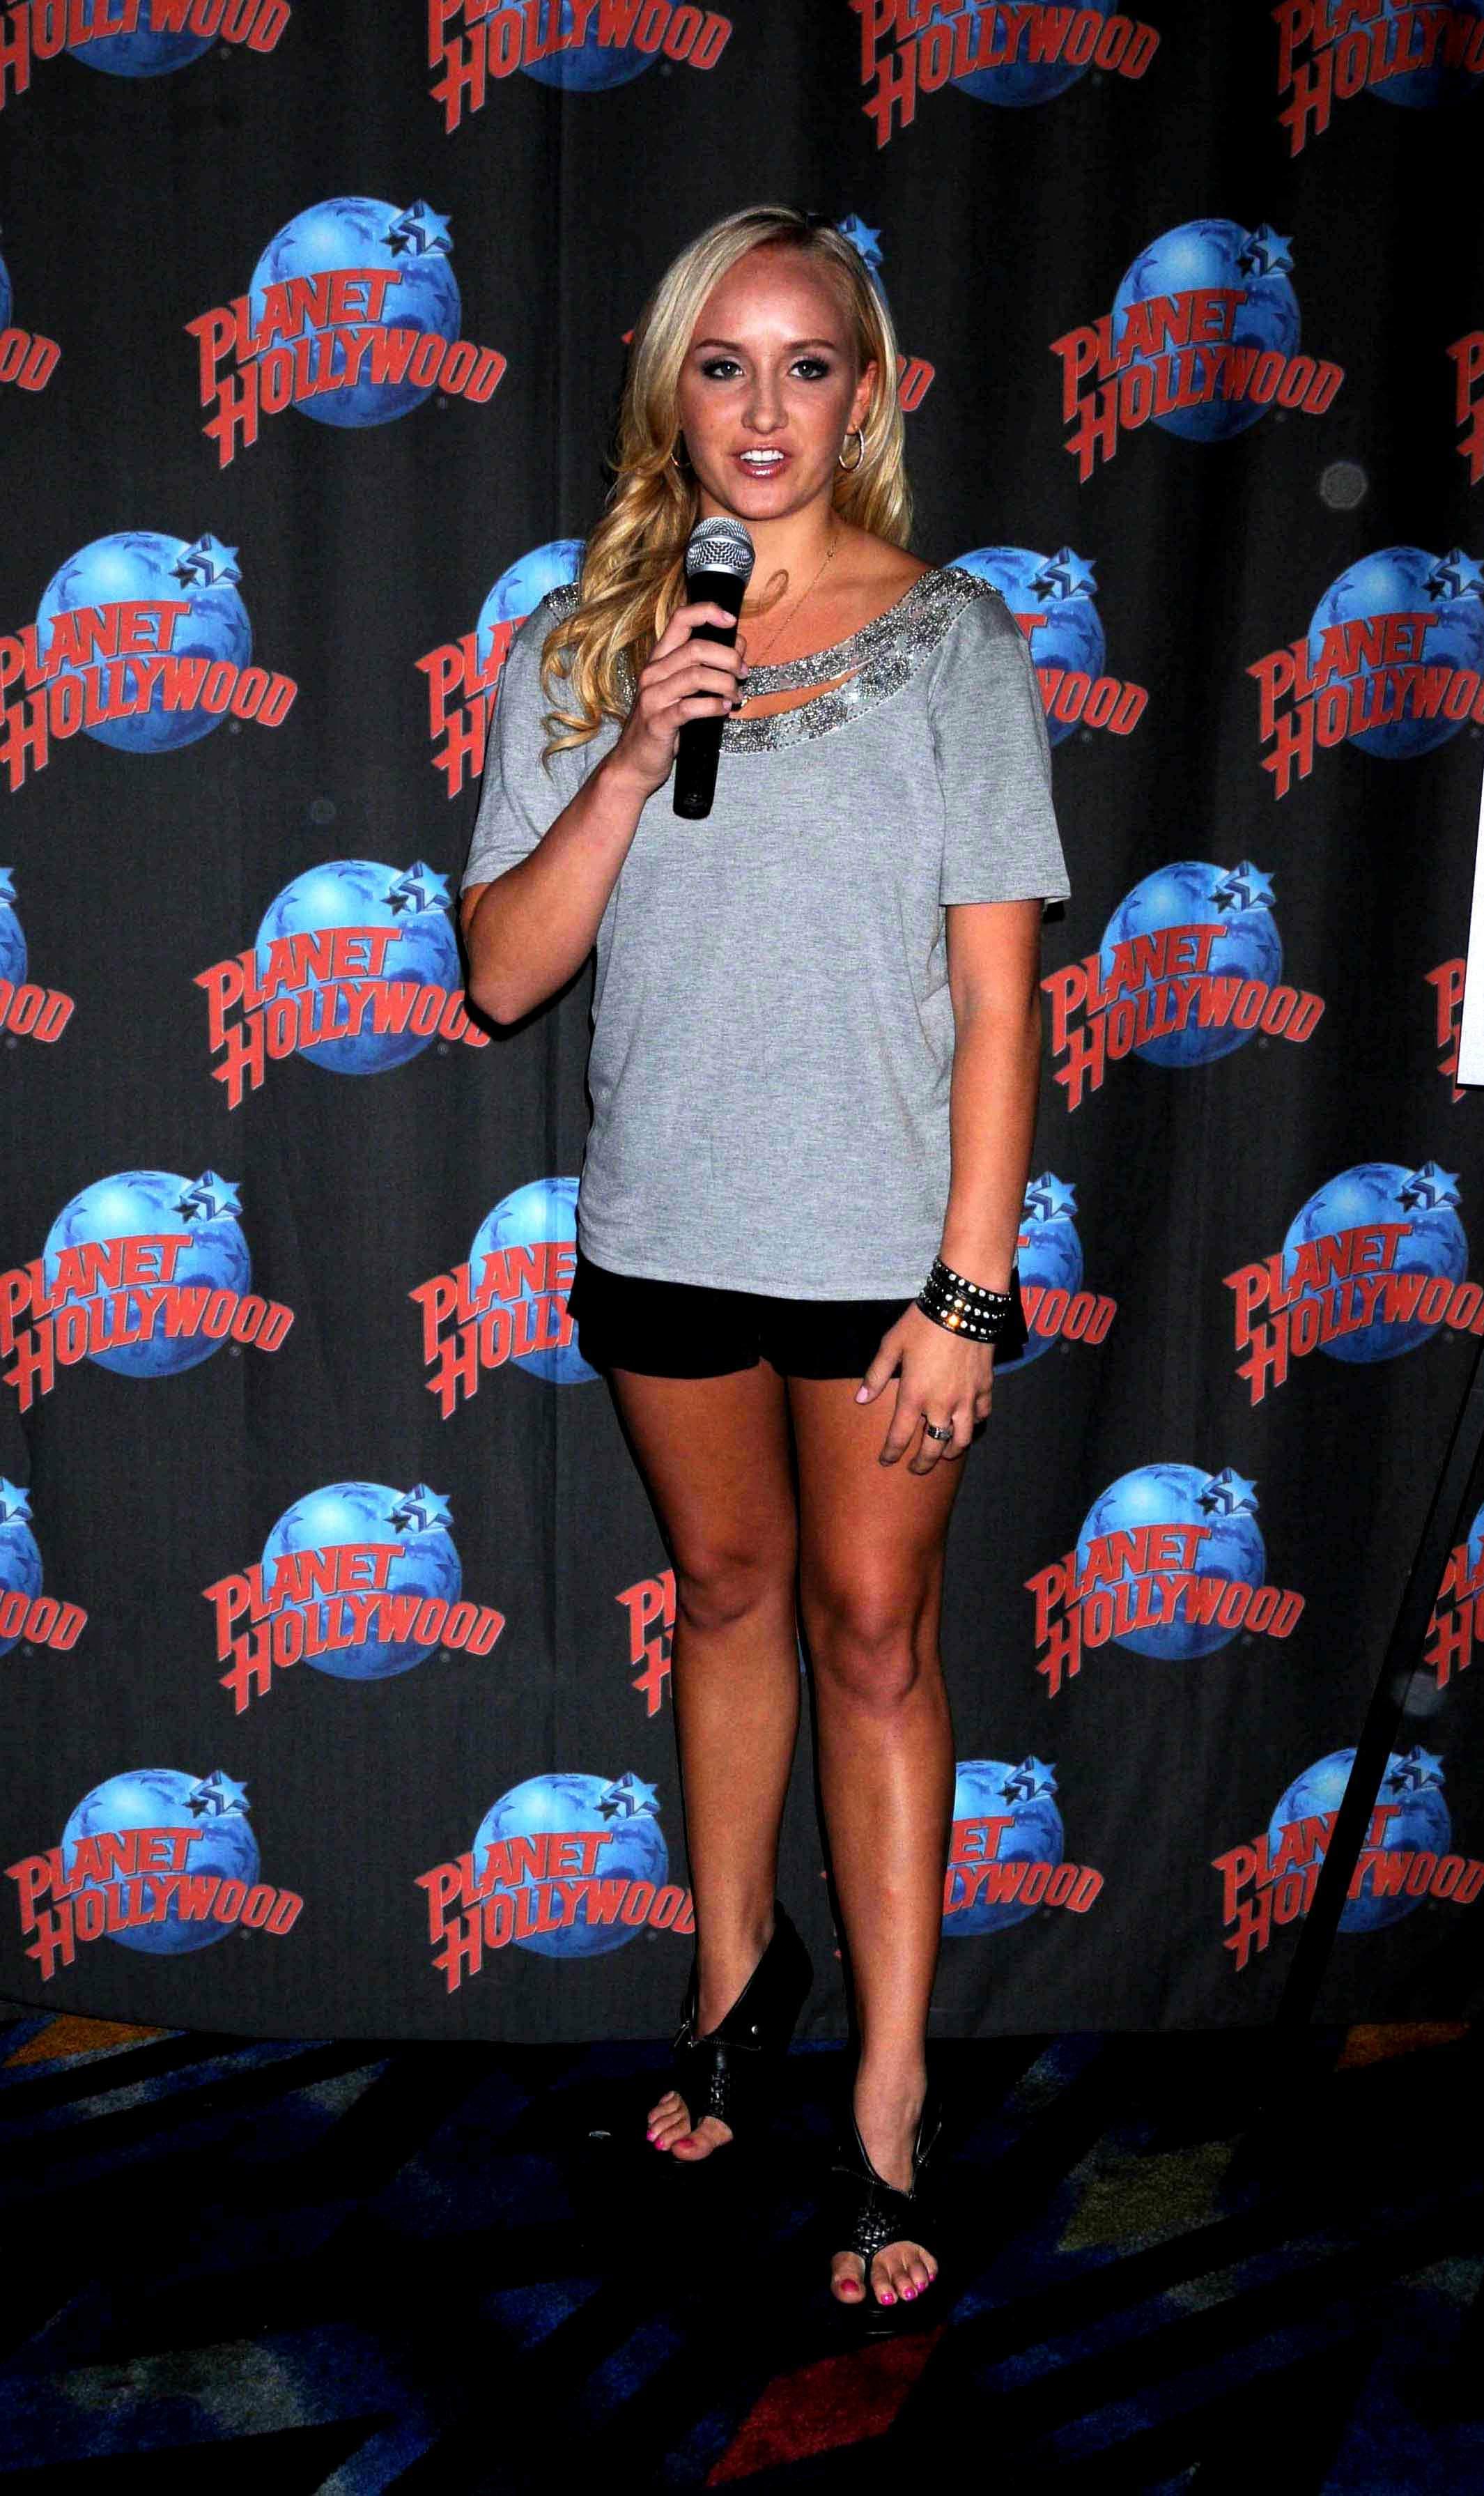 116976199_Nastia_liukin_promotes_Supergirl_clothing_line_at_Planet_Hollywood_1_122_428lo.jpg